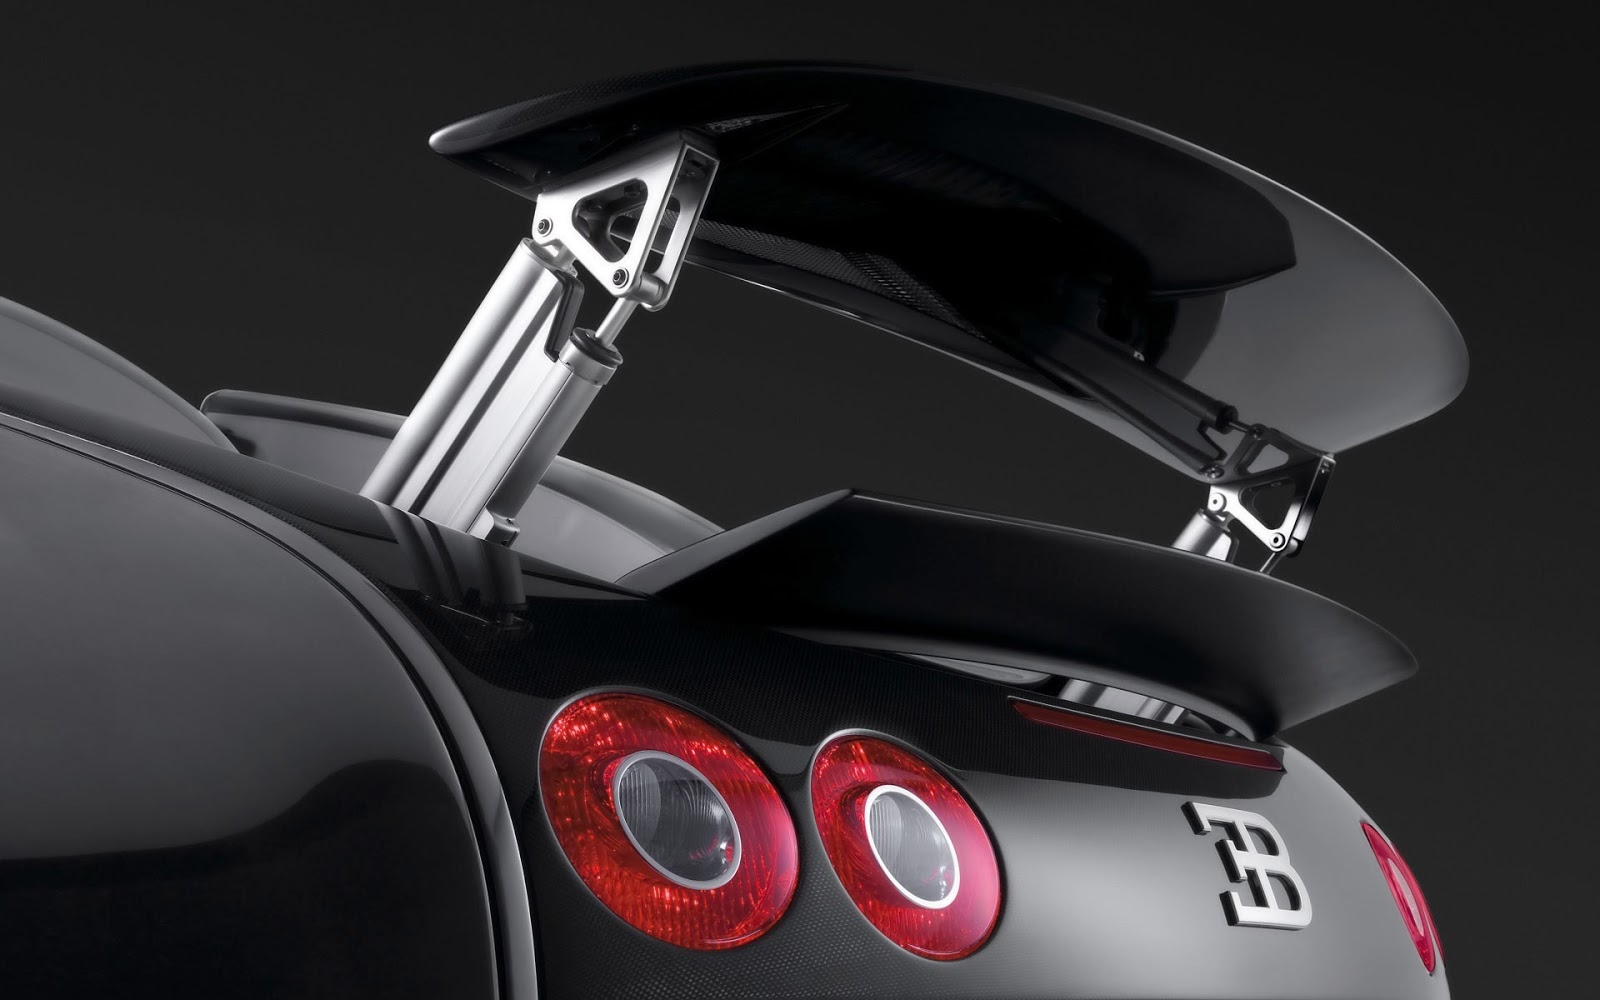 Bugatti Veyron Super Sport 2013 Wallpaper Hd In Black: Bugatti Veyron Super Sport 2013 HD Wallpaper